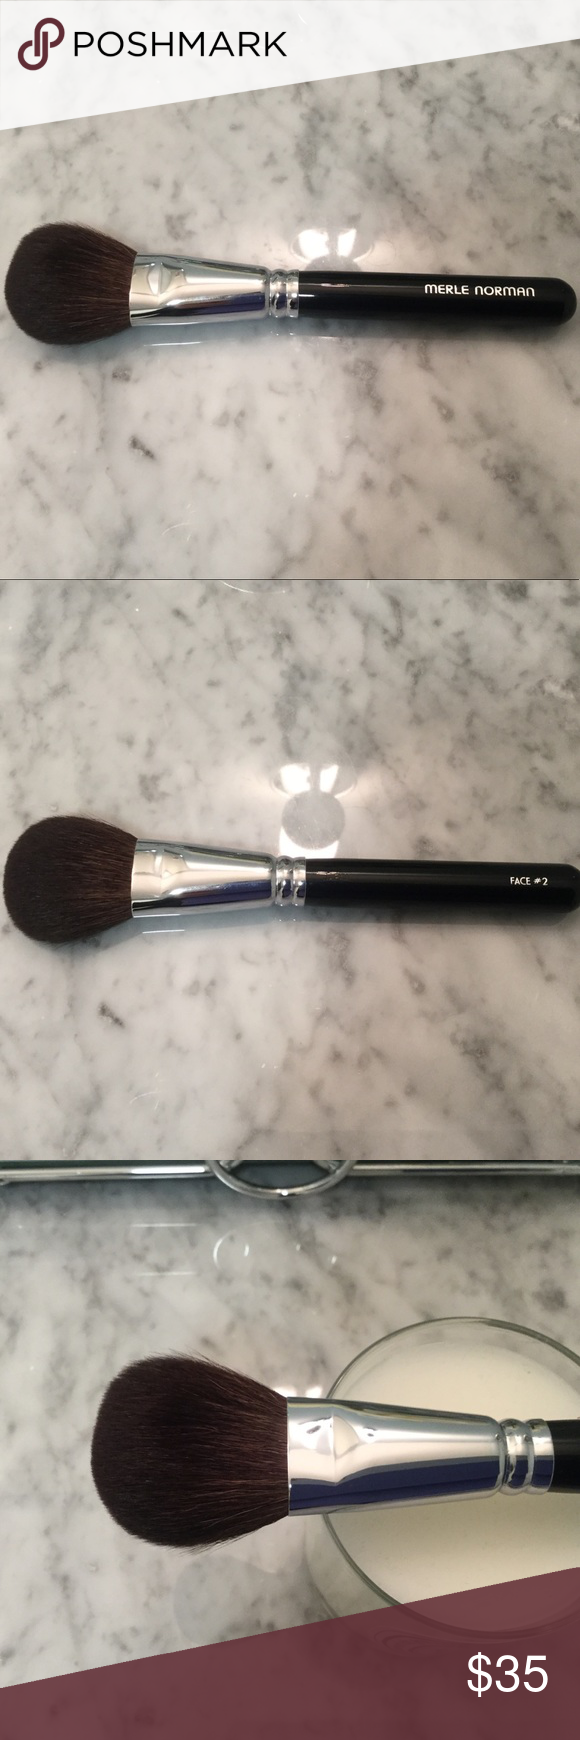 NWOB Merle Norman Powder Brush 2 Powder brush, Natural